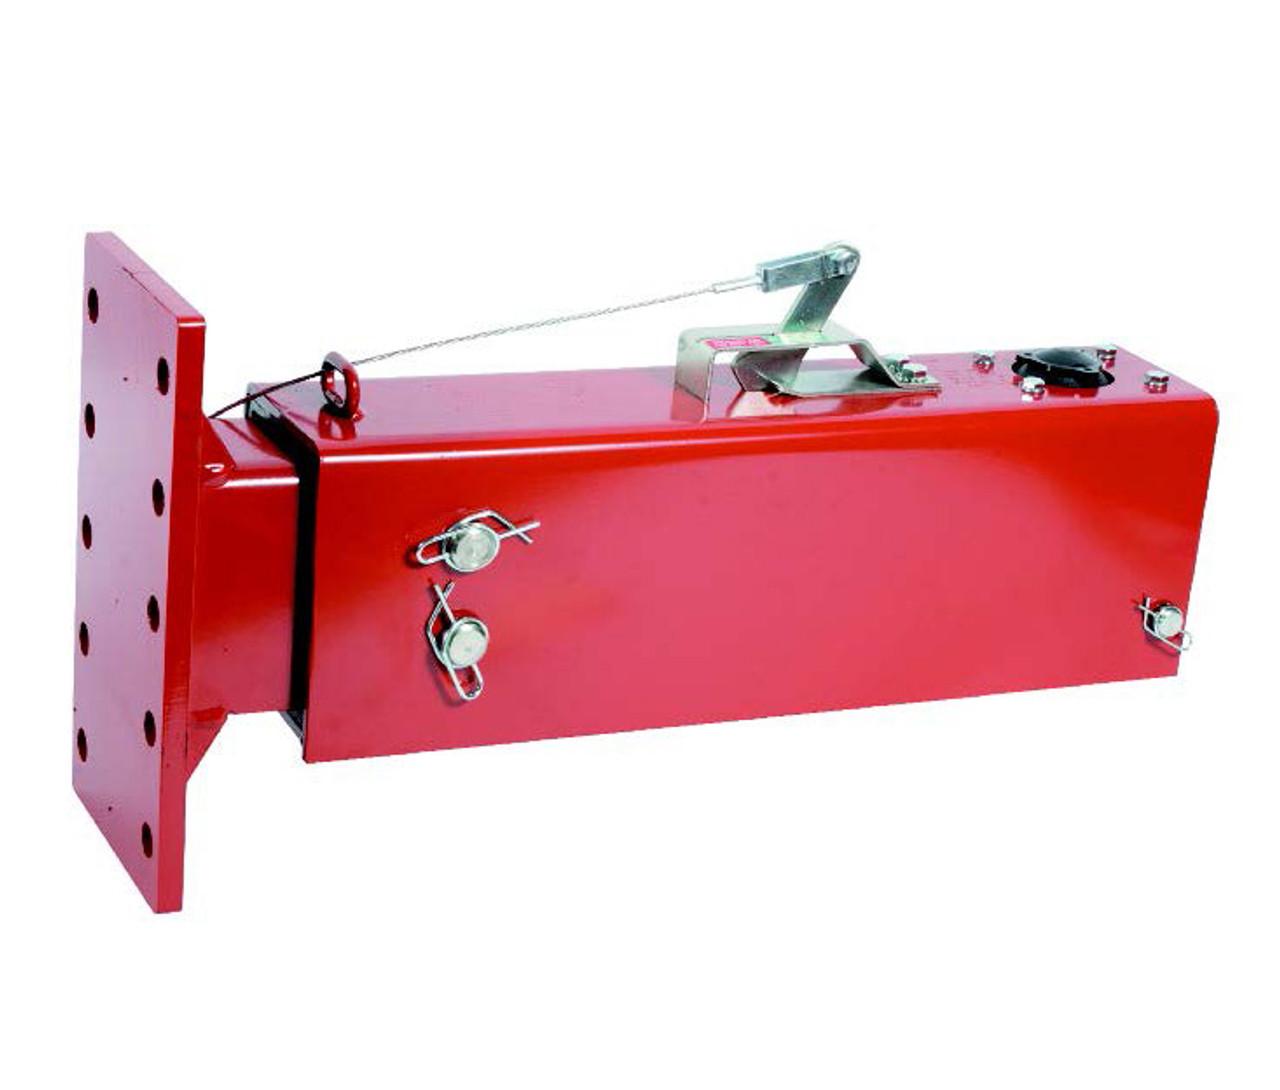 8202052 --- Demco Hydraulic Brake Actuator with Flat Plate - 20,000 lb Capacity - Model DA20